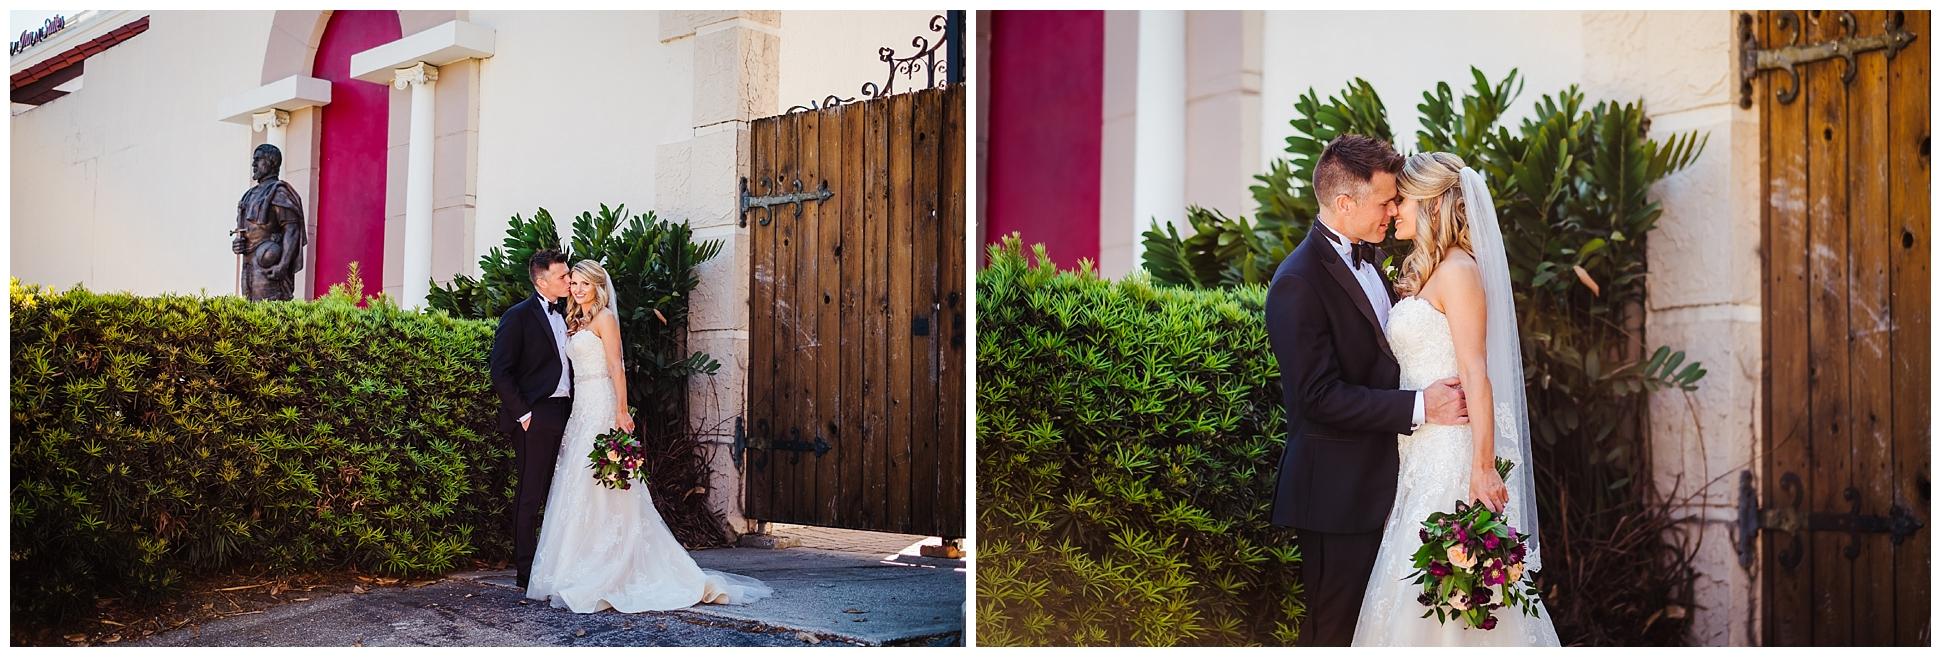 tampa-bradenton-wedding-photographer-south-florida-museum-classic-blush-gold-alpacas-sparklers_0040.jpg